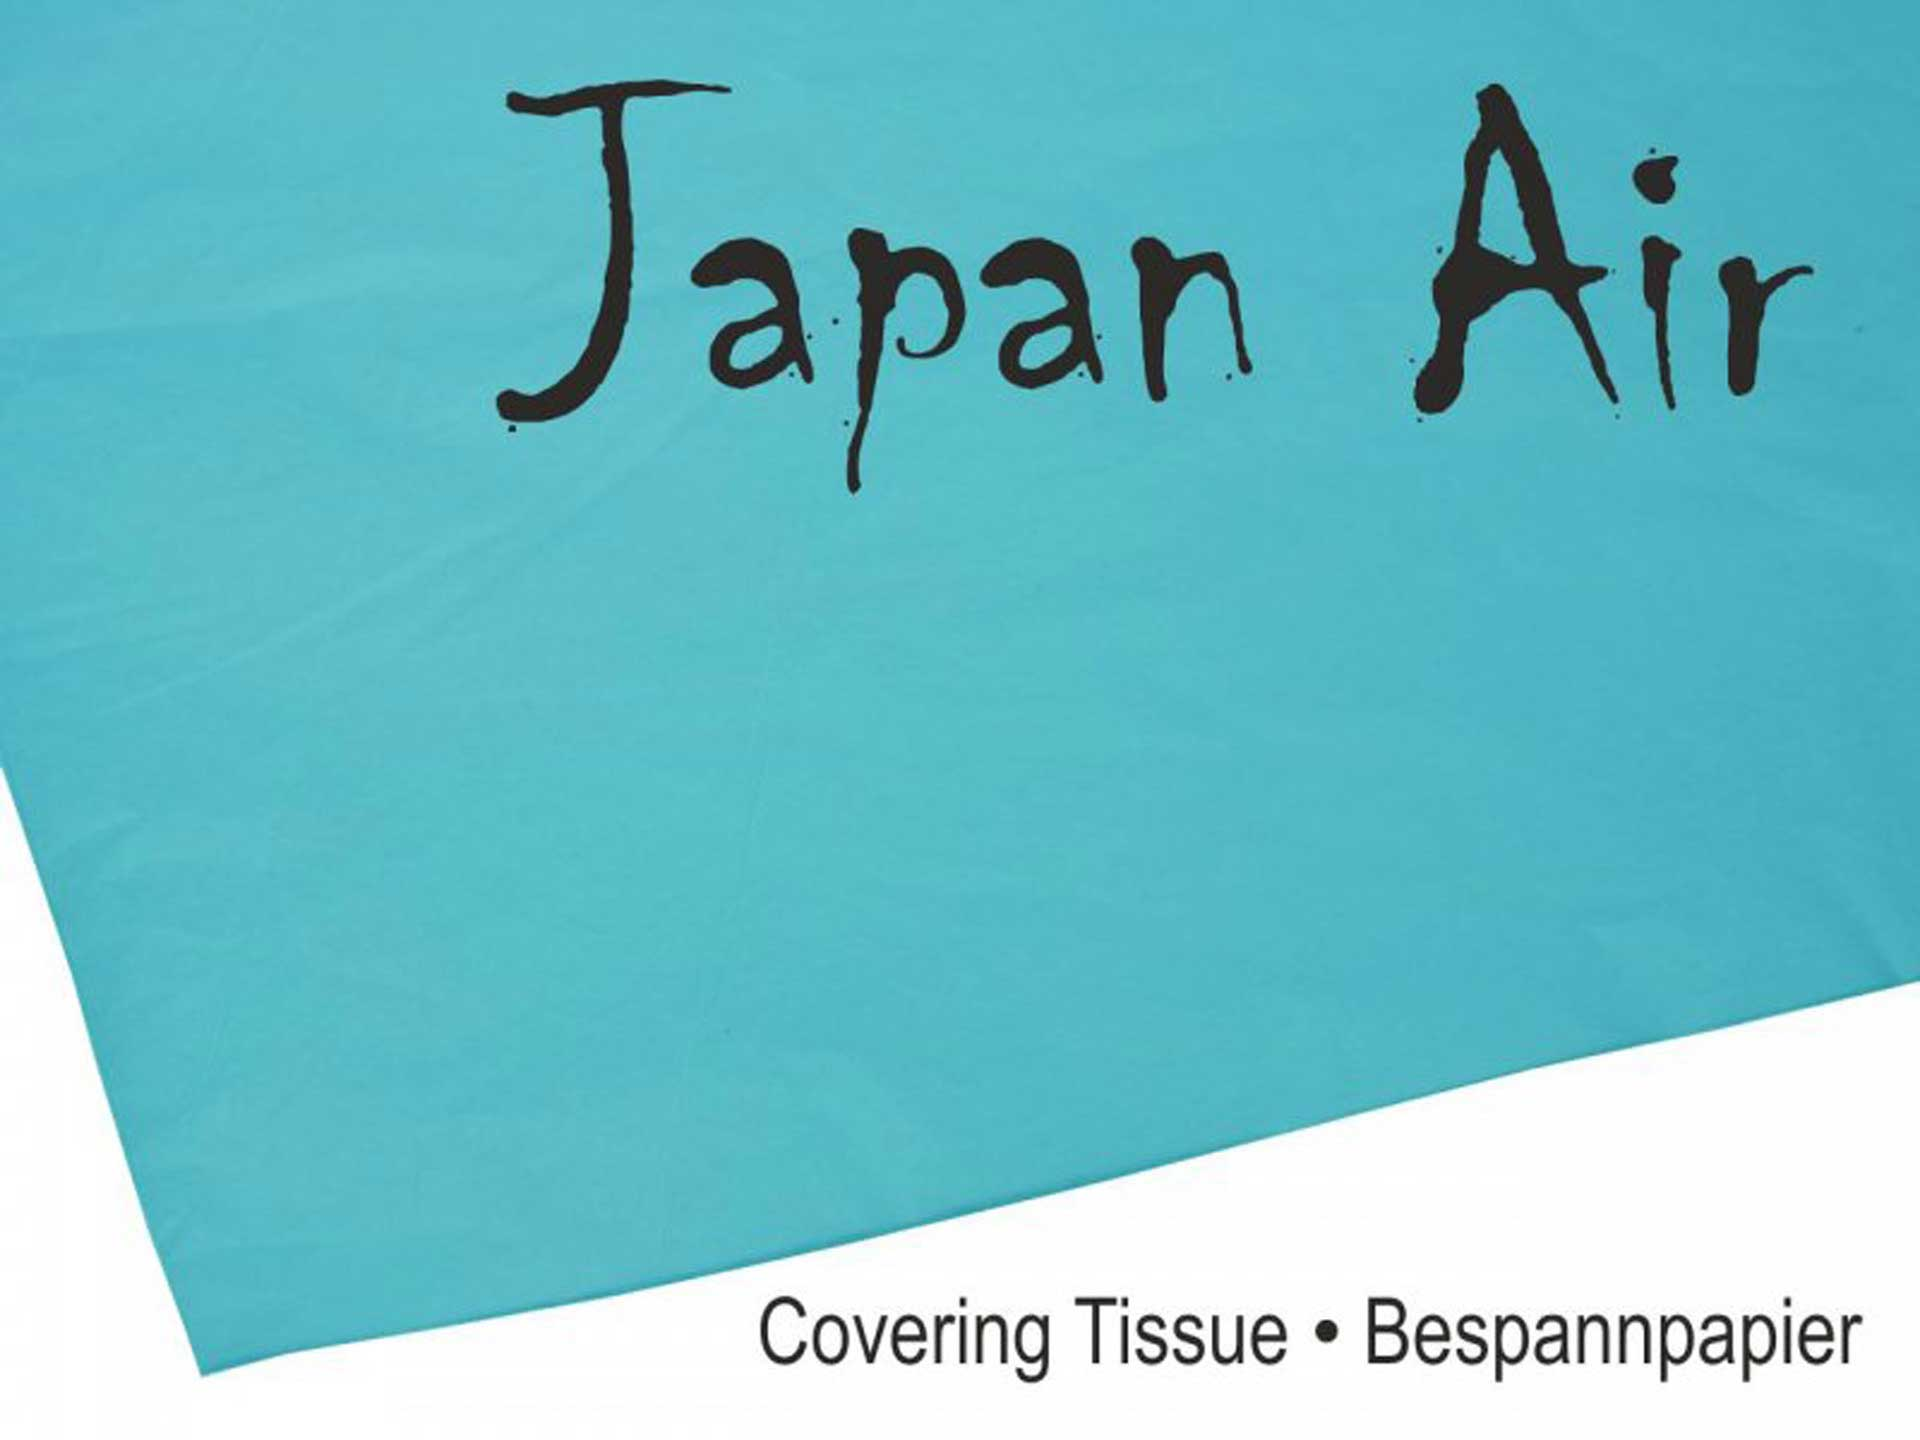 MODELLBAU LINDINGER JAPAN AIR Bespannpapier 16g blau 500 x 750 mm 10Stk. gerollt